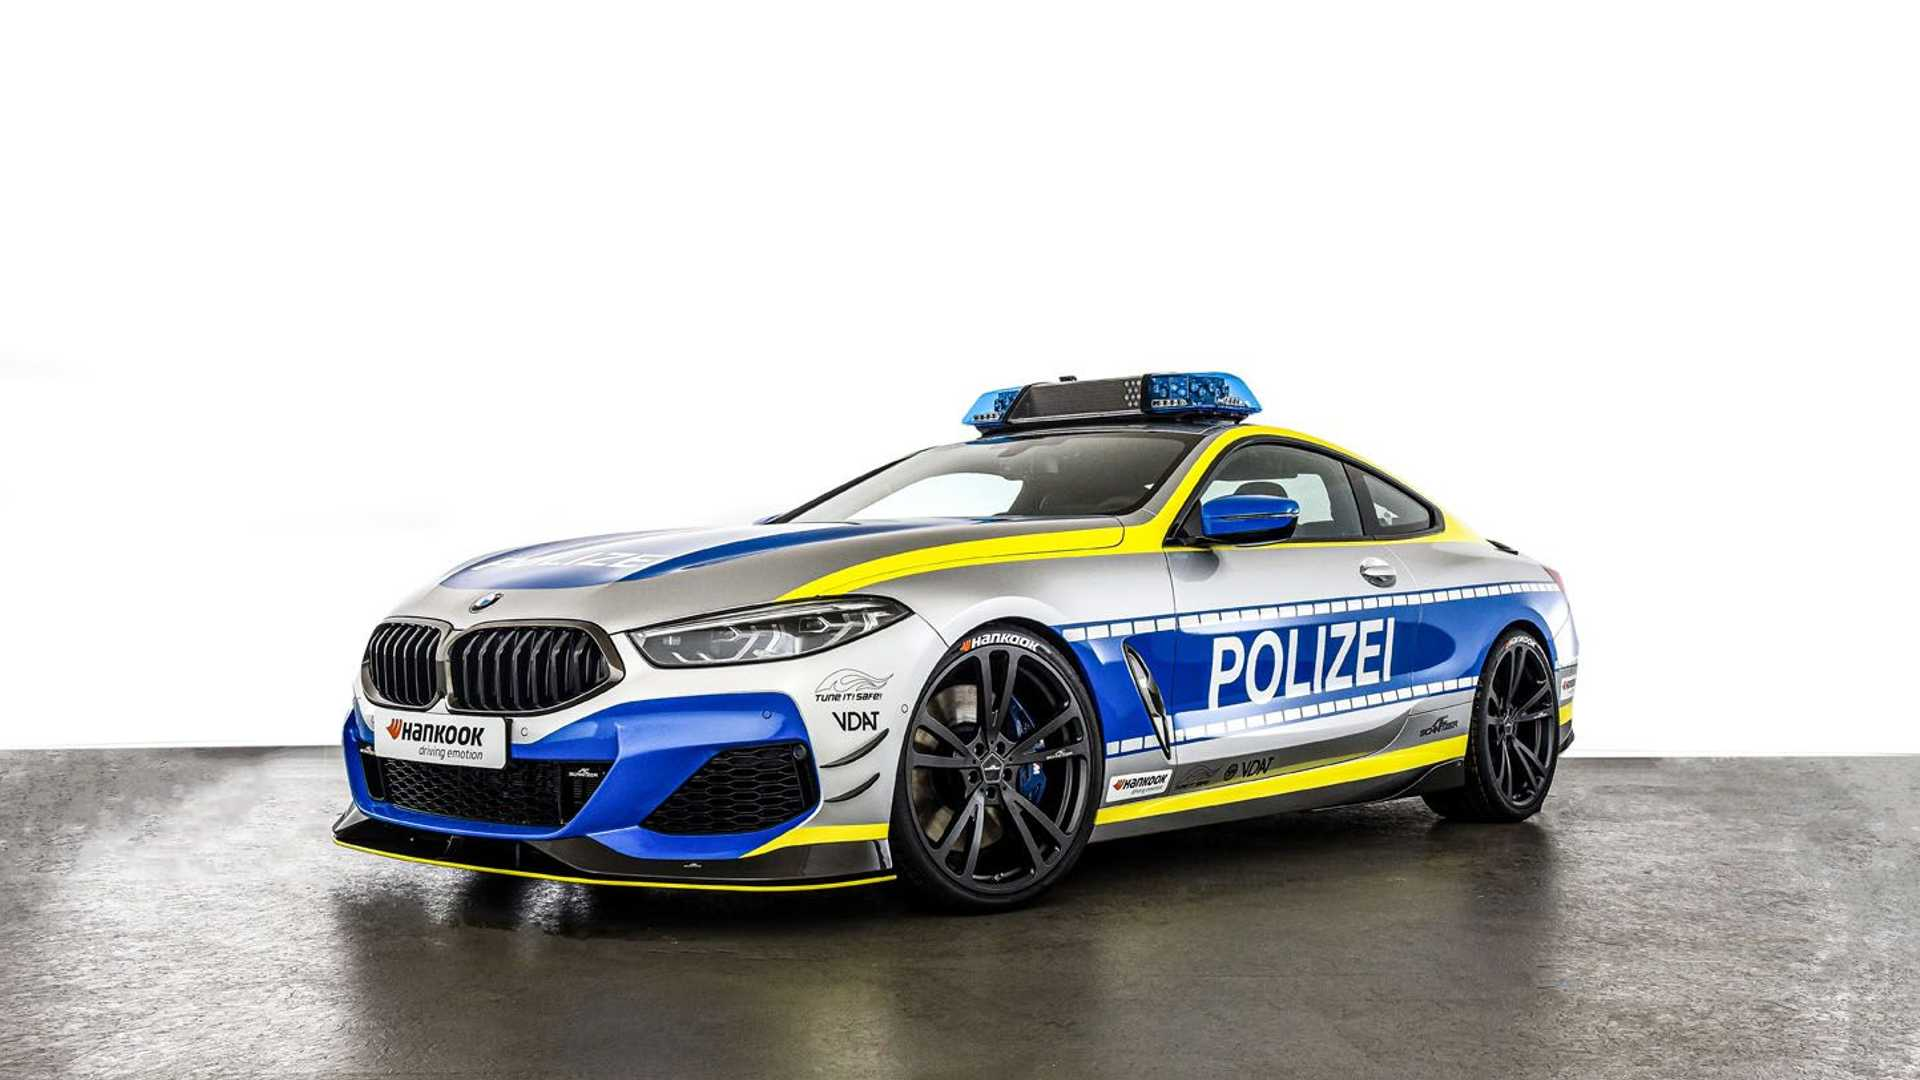 BMW-M850i-police-car-tune-it-safe-3